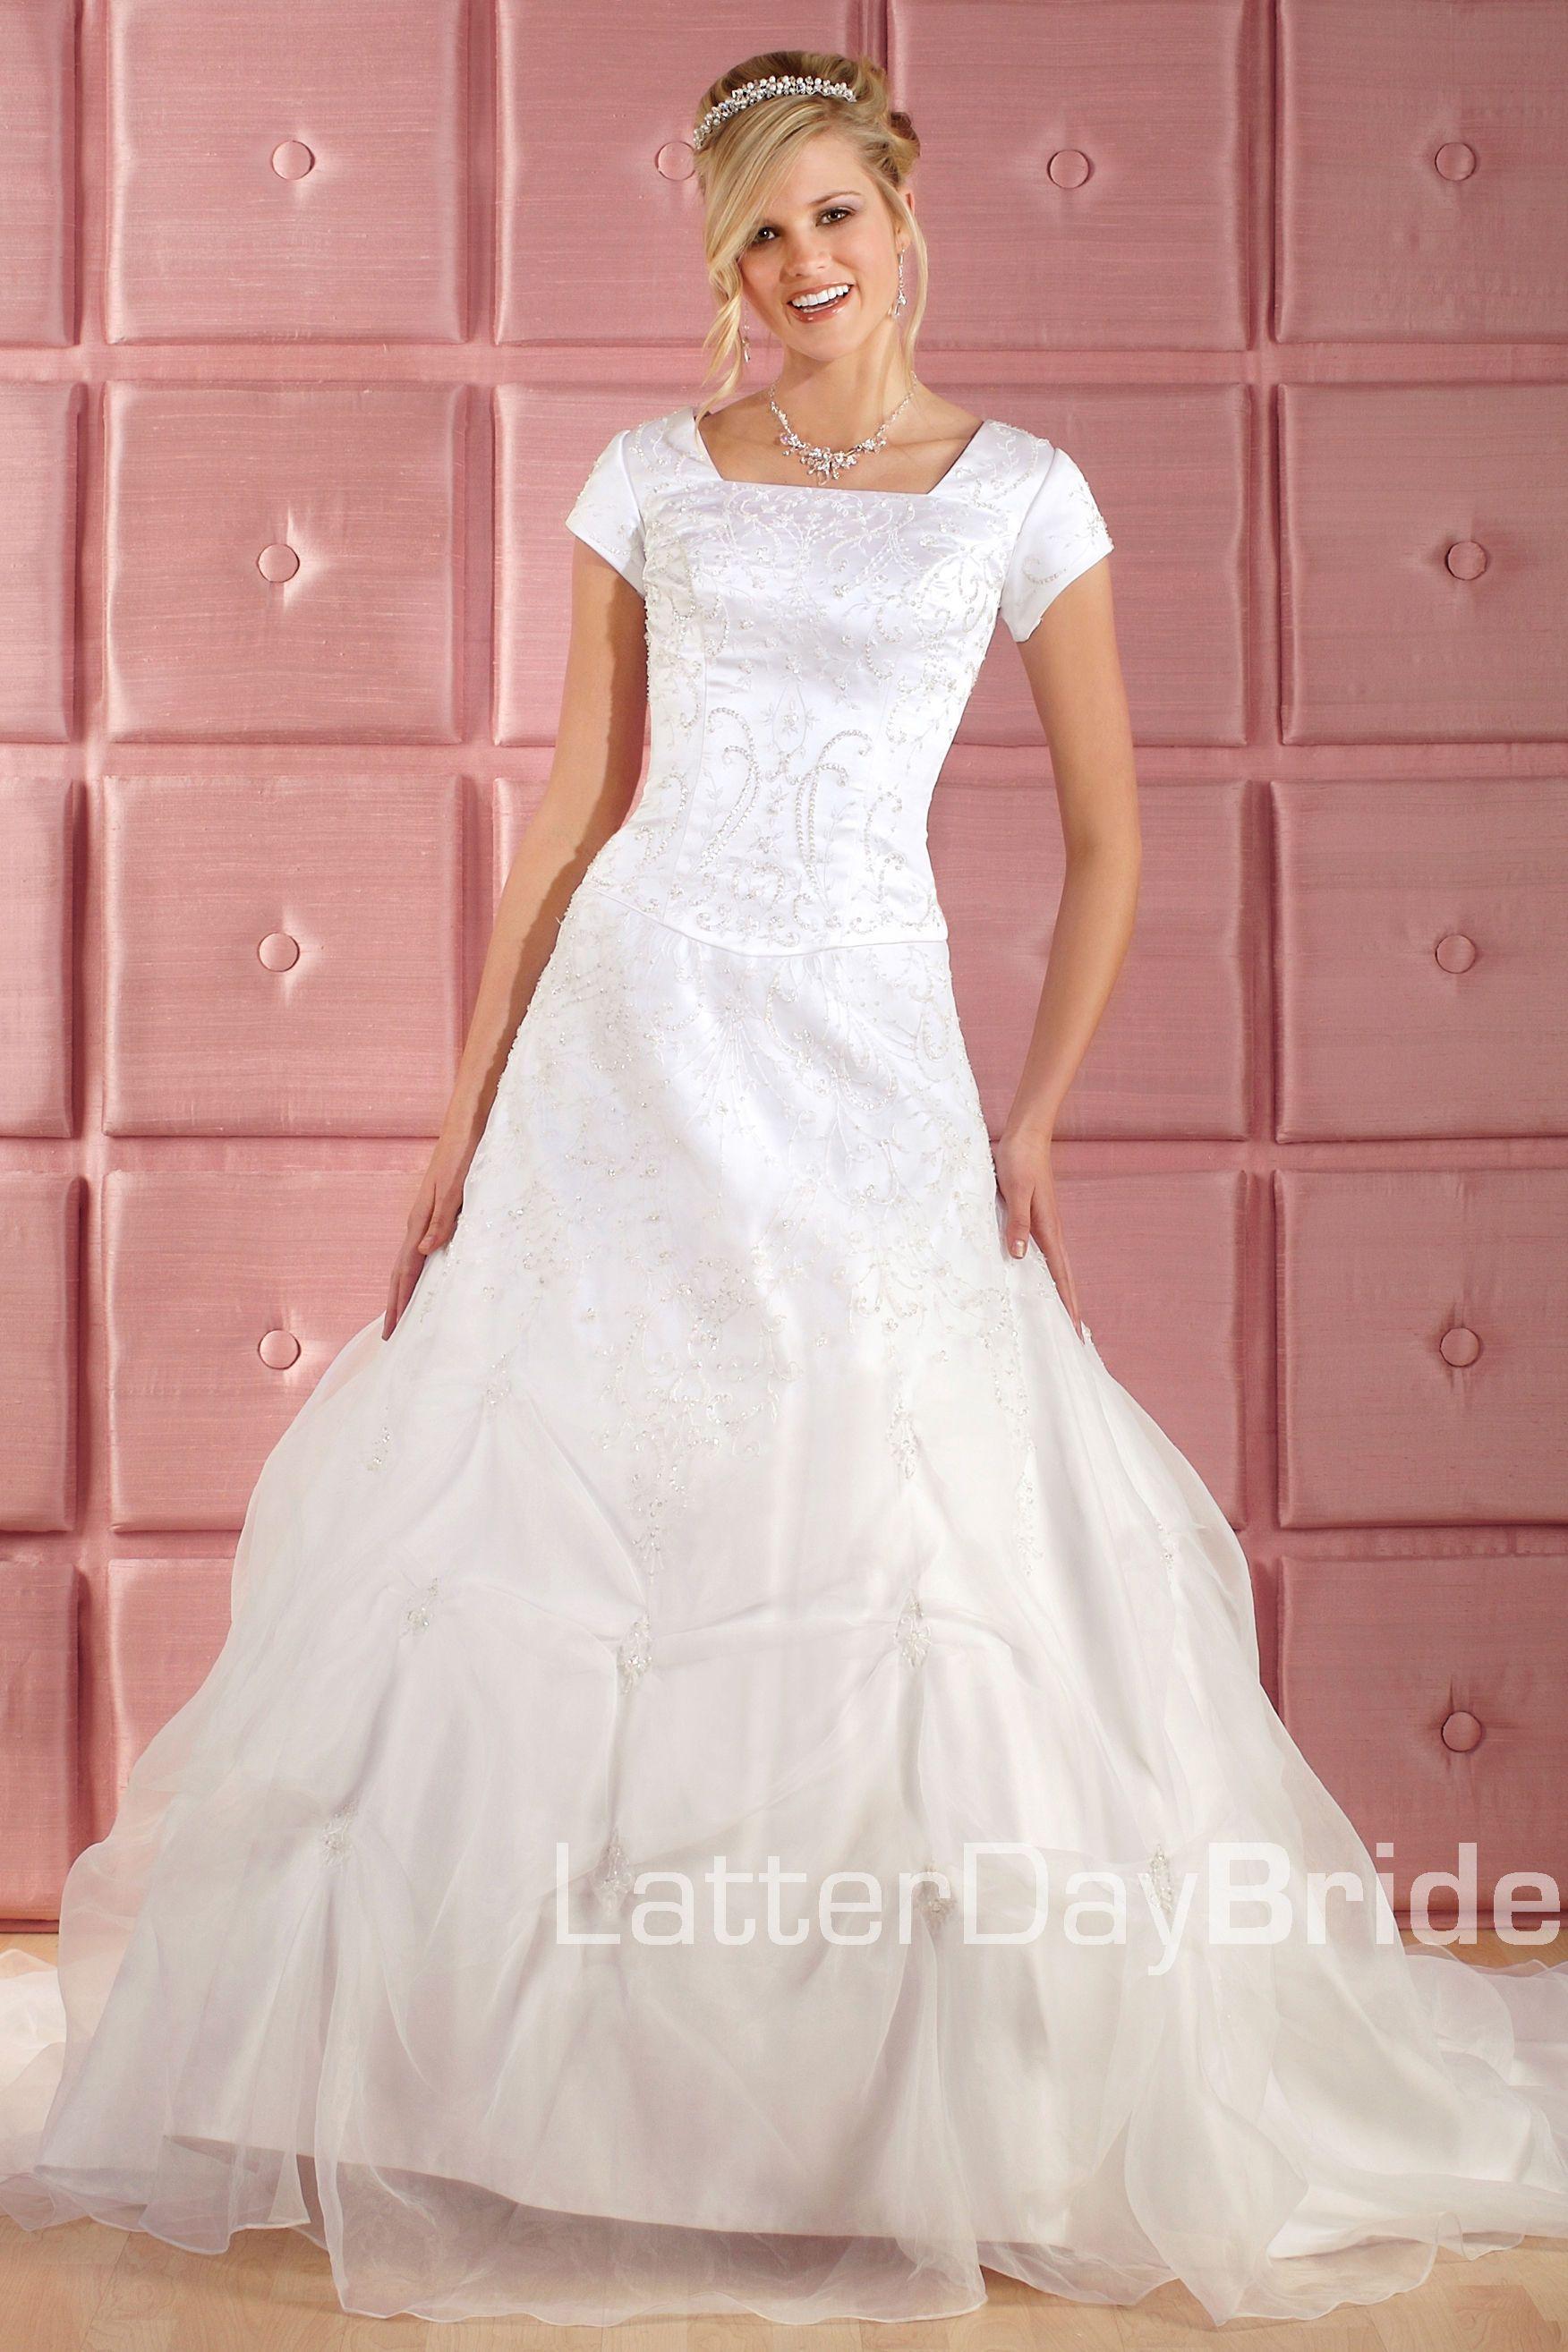 Modest Wedding Dress, Wellington   LatterDayBride & Prom. Modest ...